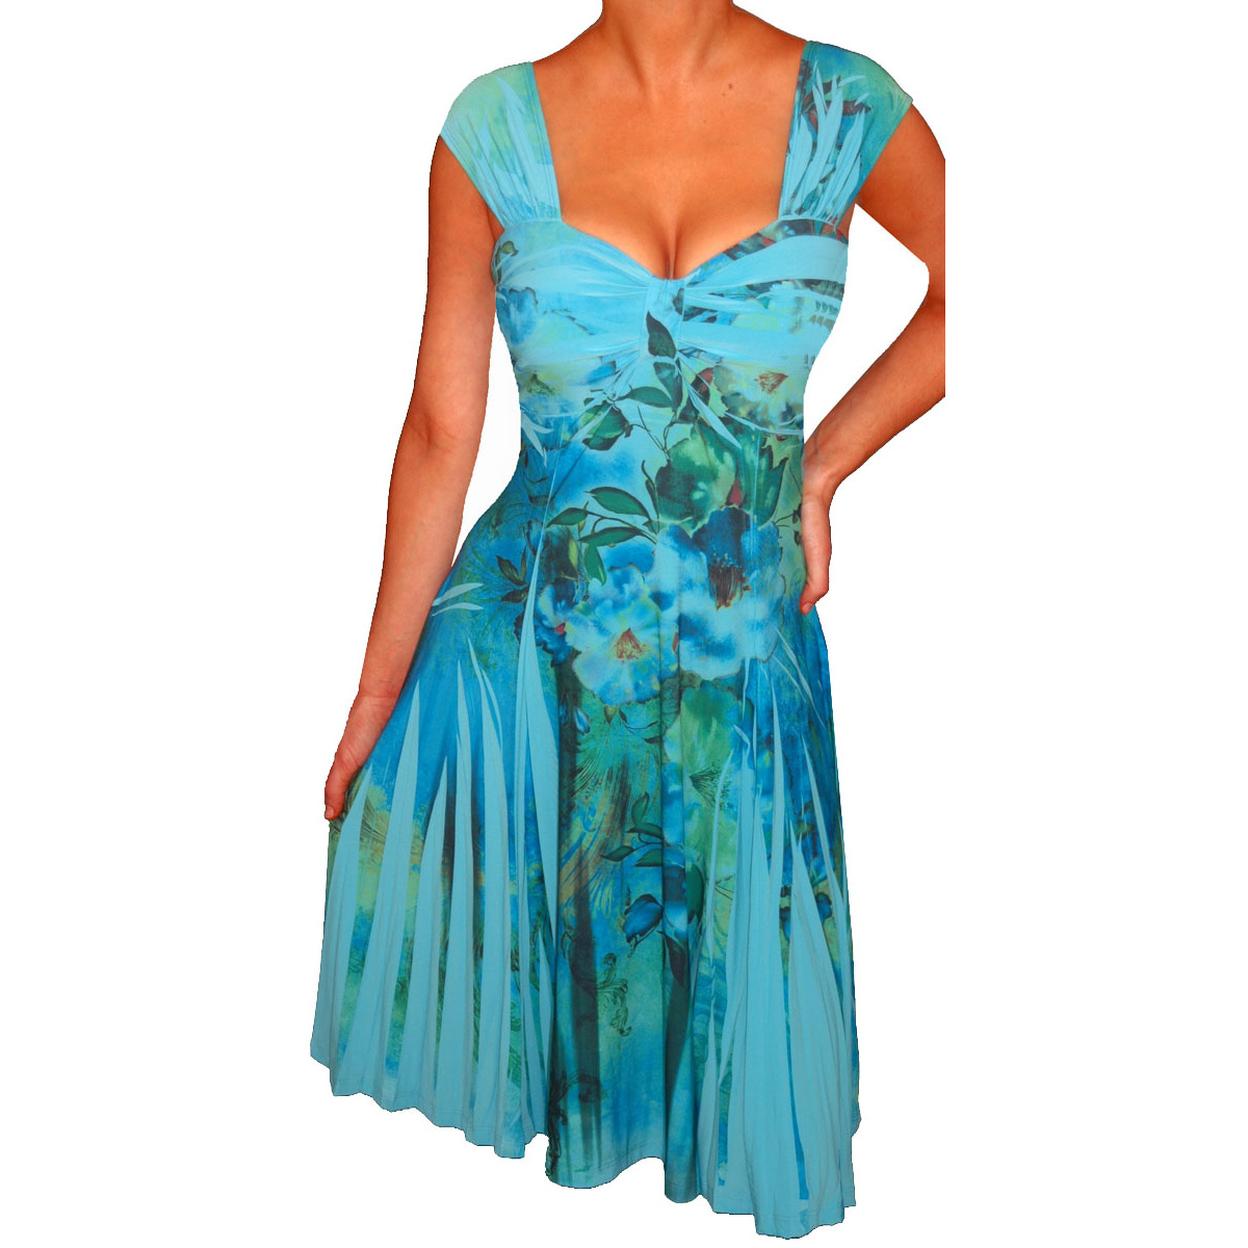 Nordstrom Rack Plus Size Formal Dresses – DACC